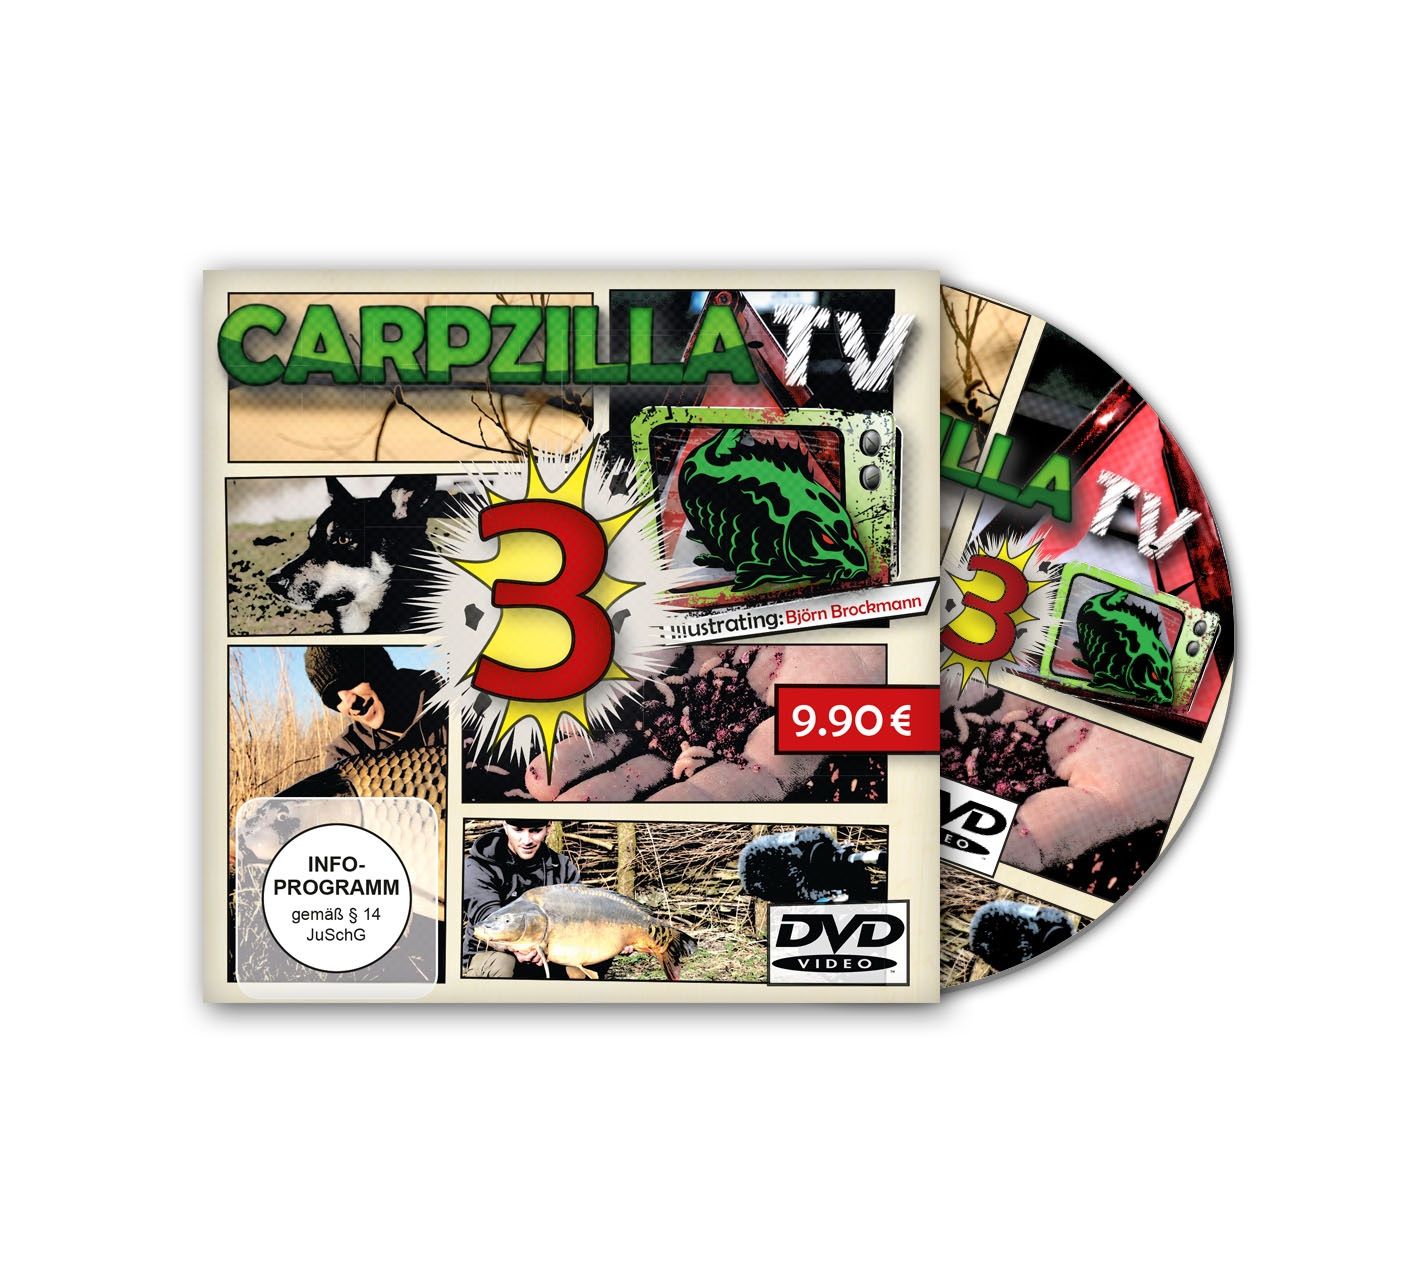 image2 - Carpzilla tv #03